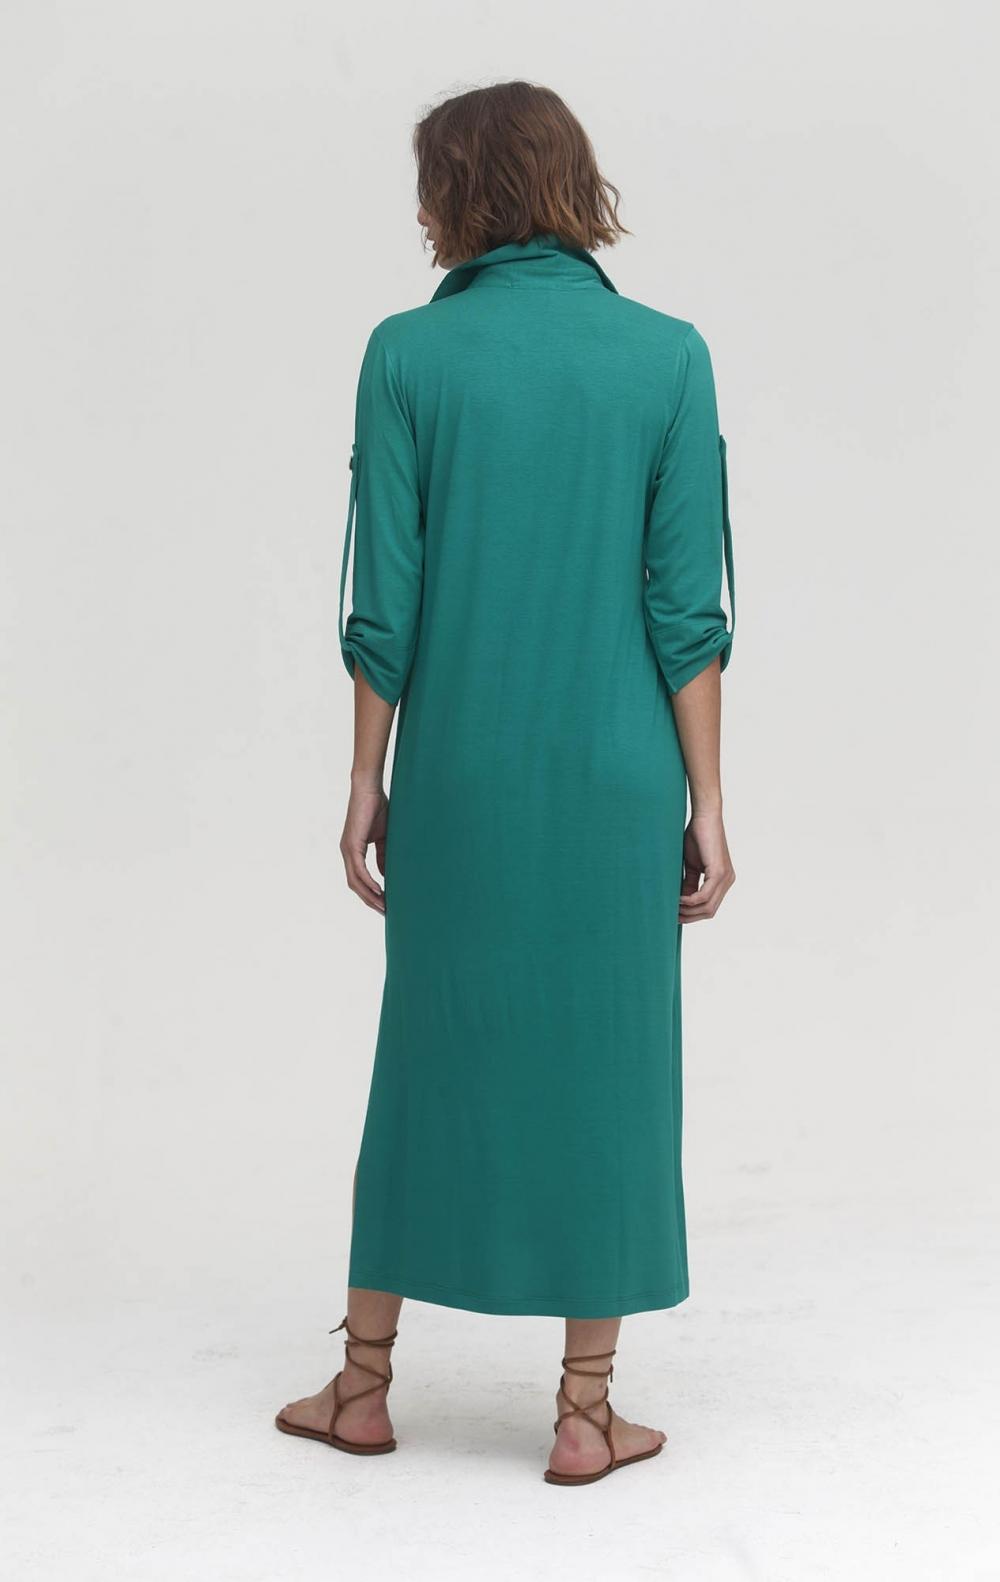 Vestido Malha Gola Polo Verde  - Foto 2